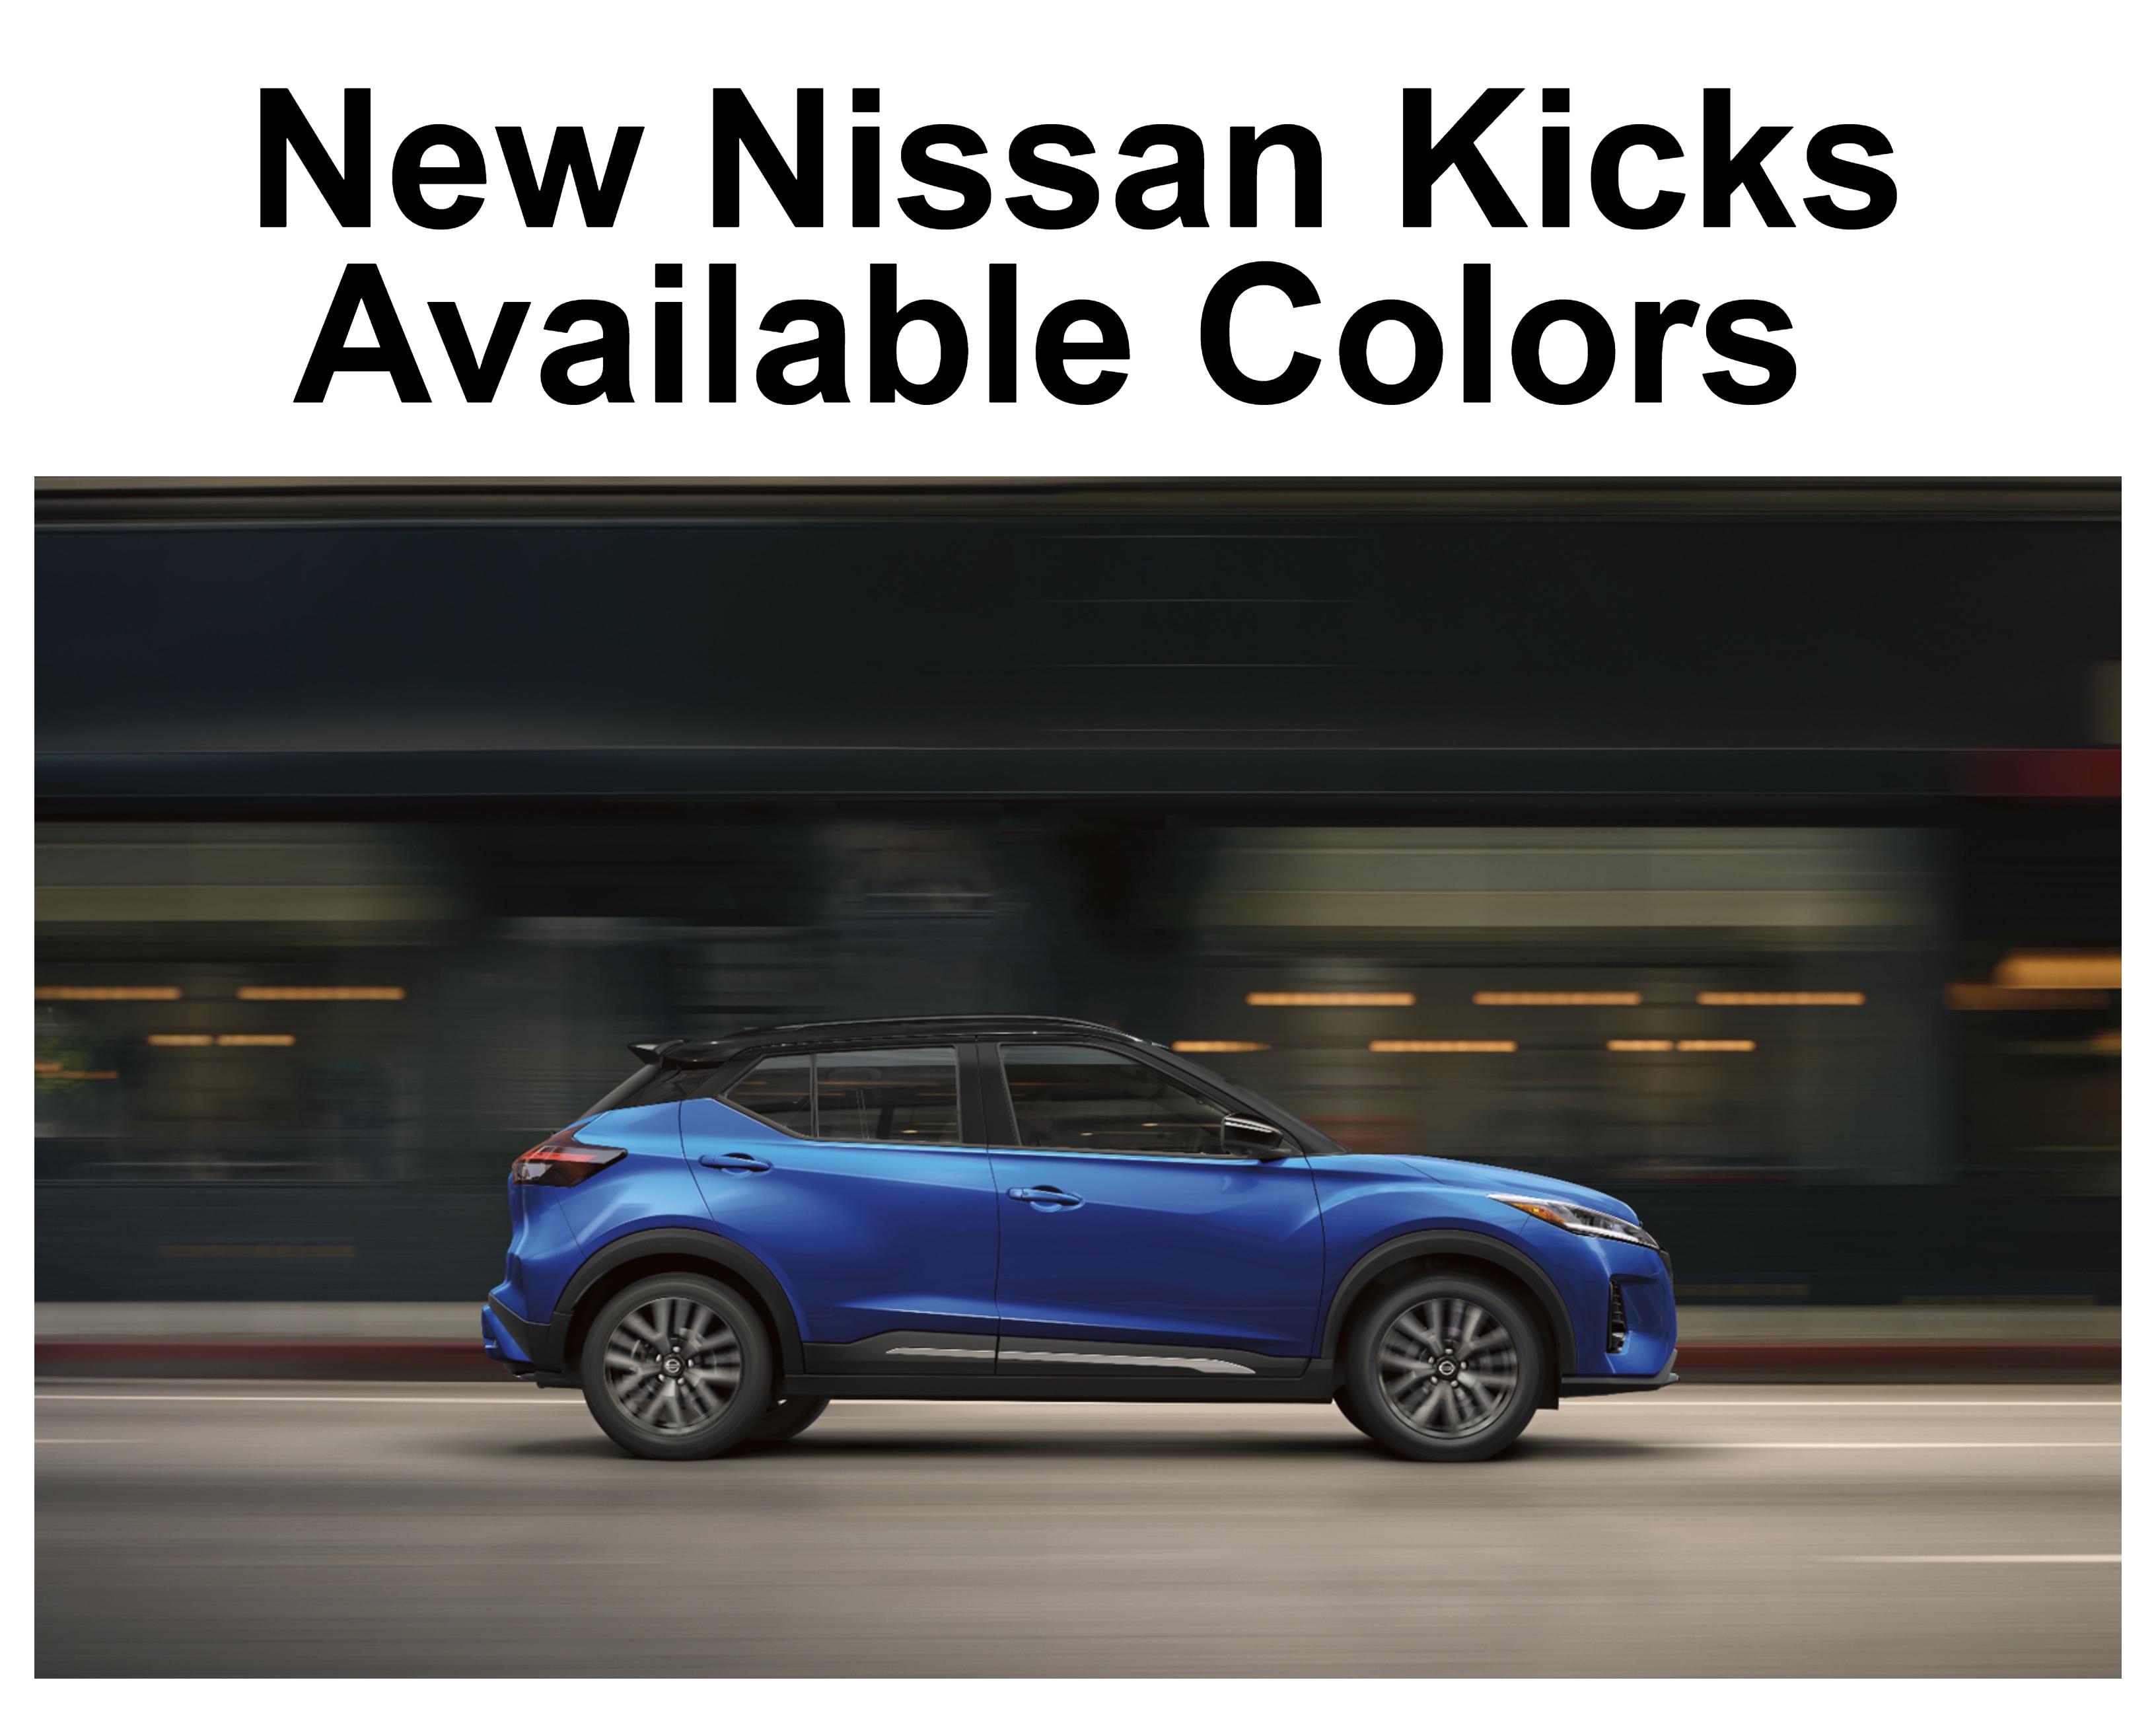 Side View of Blue Nissan Kicks Driving